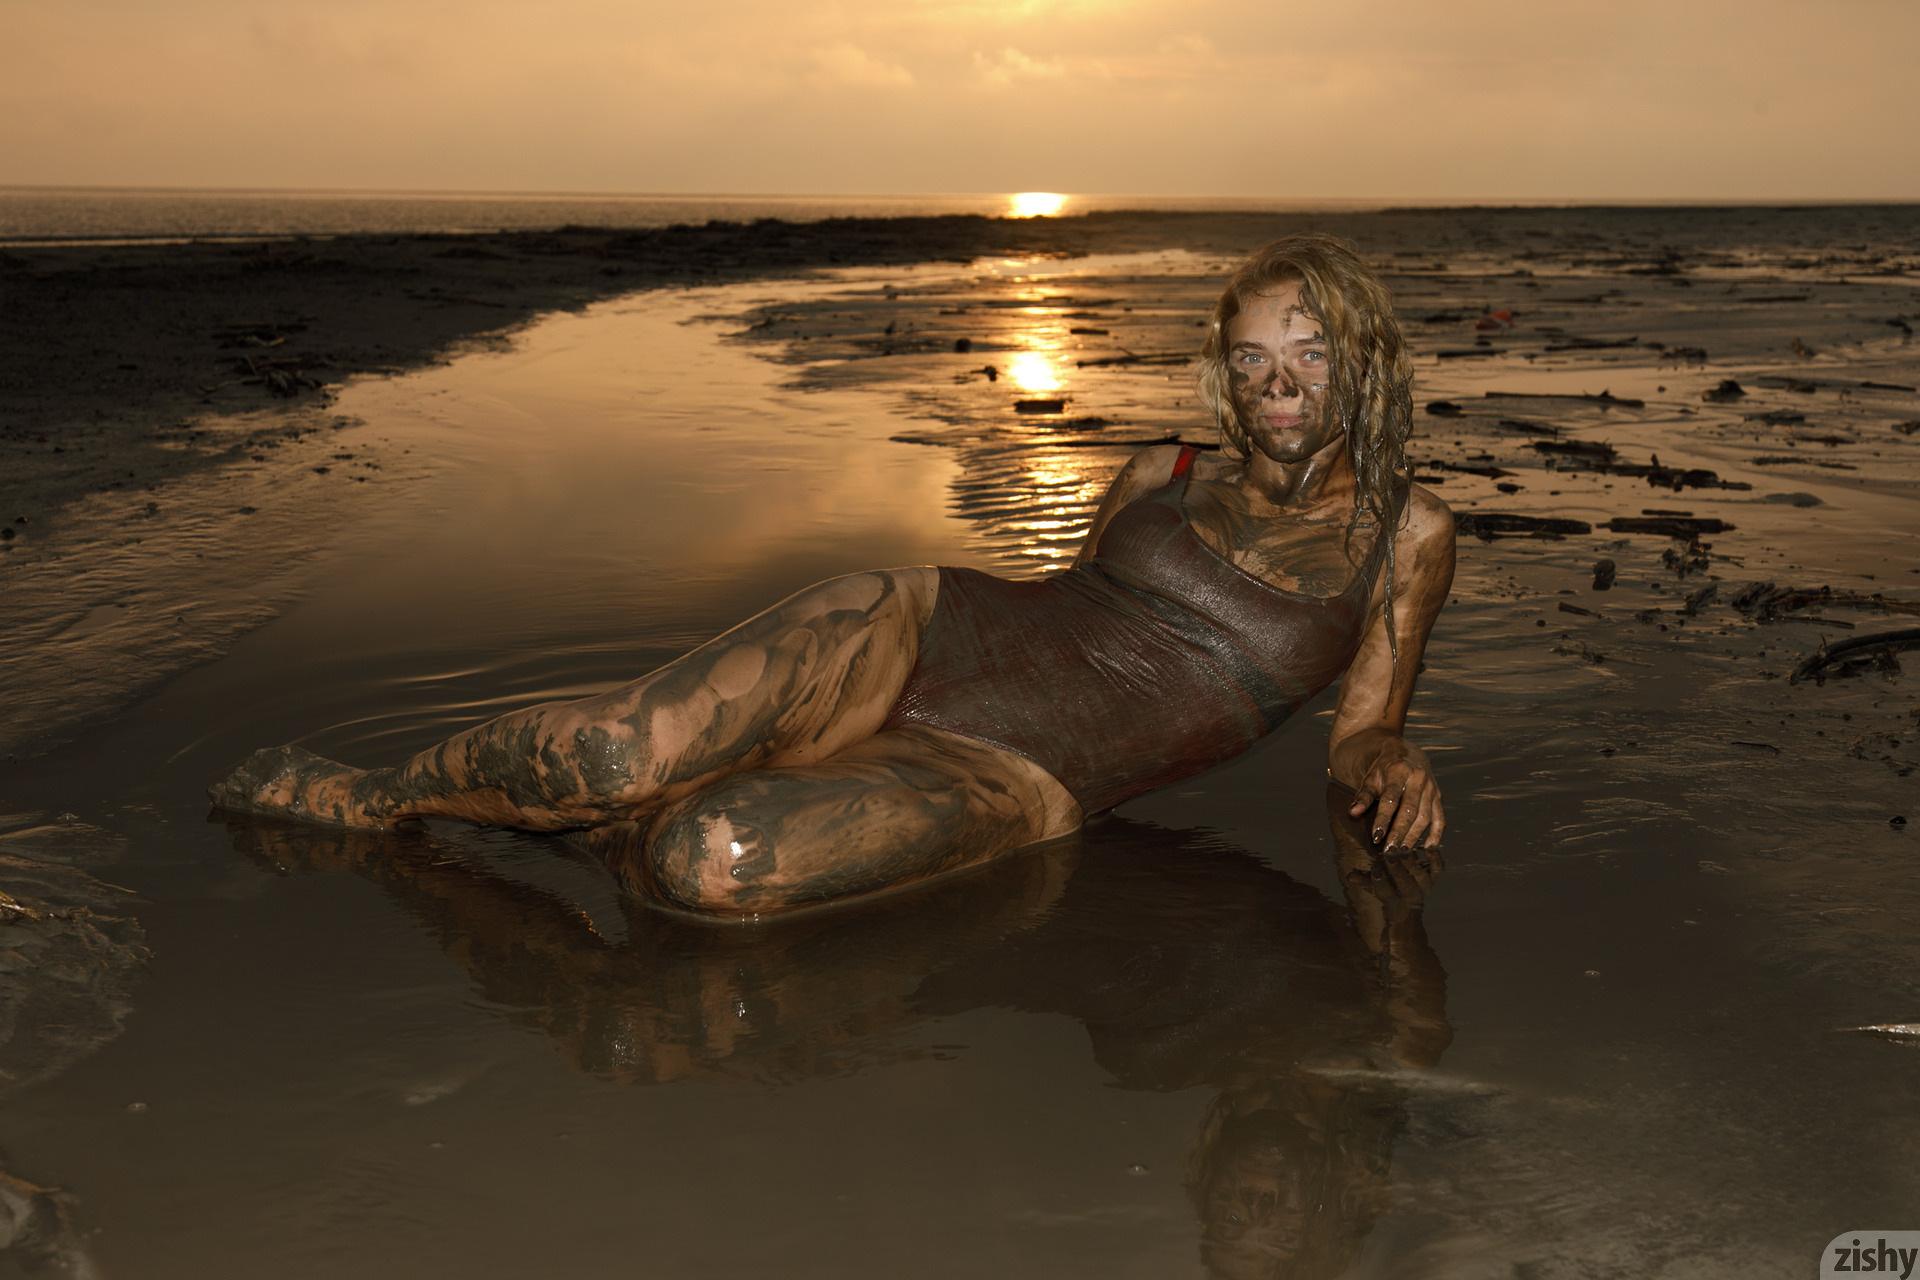 Sofia Orlova On Gryaznyy Beach Zishy (56)